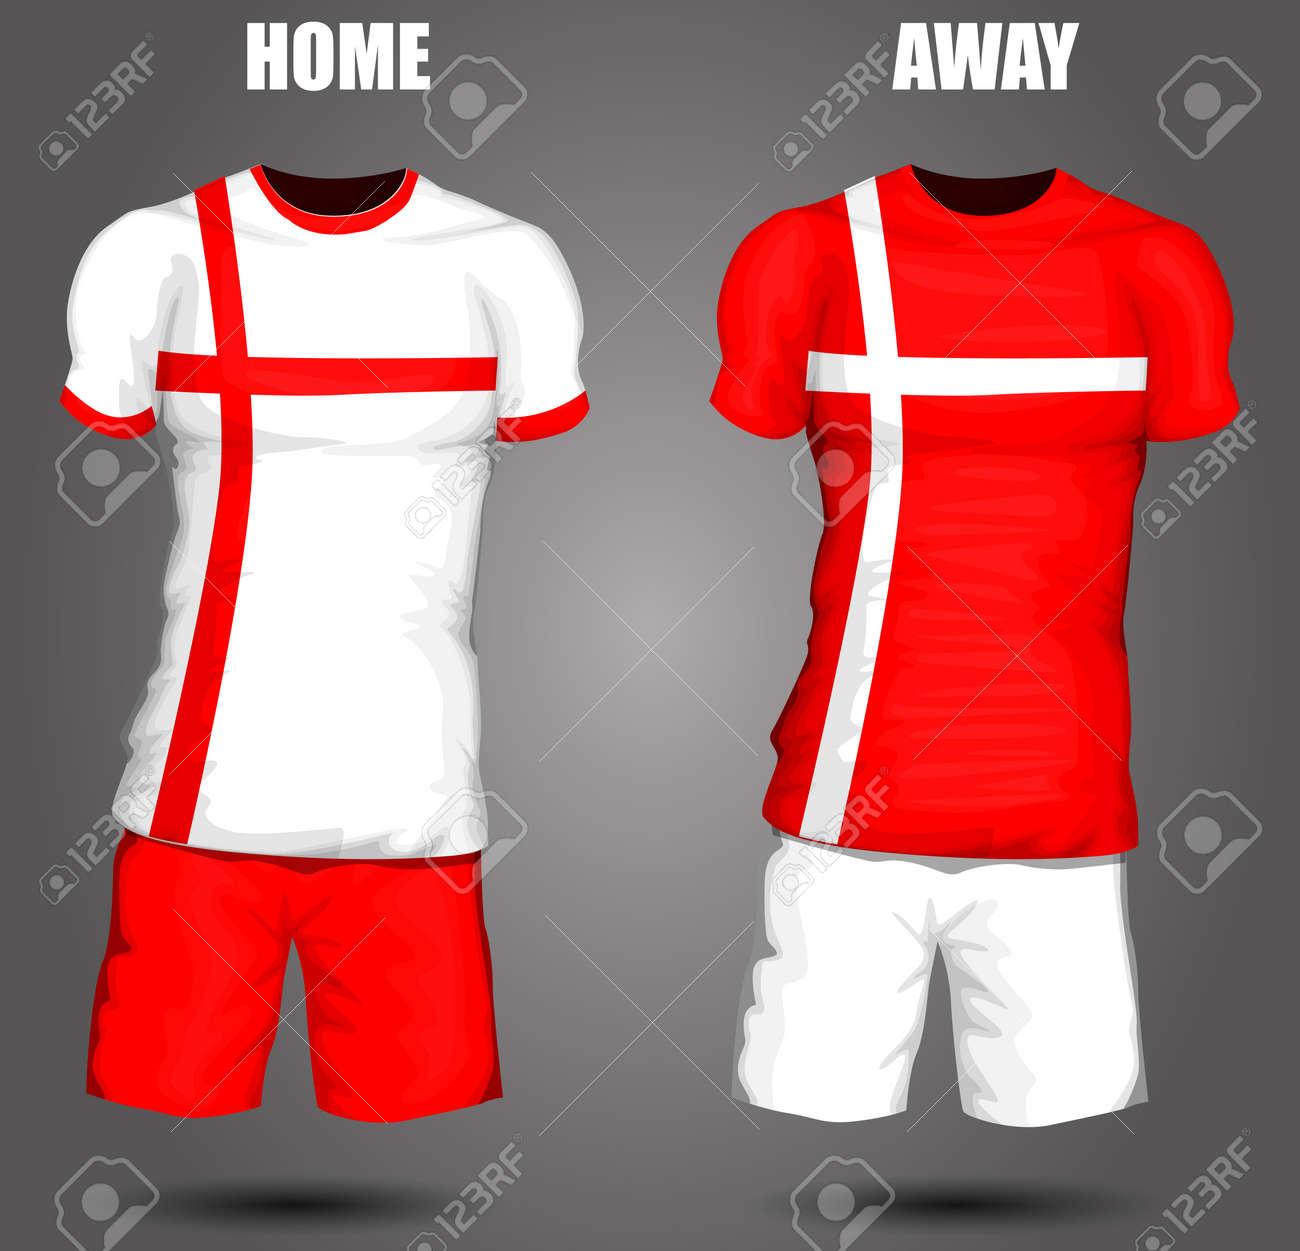 c4c99b60b England soccer jersey Stock Vector - 28036604